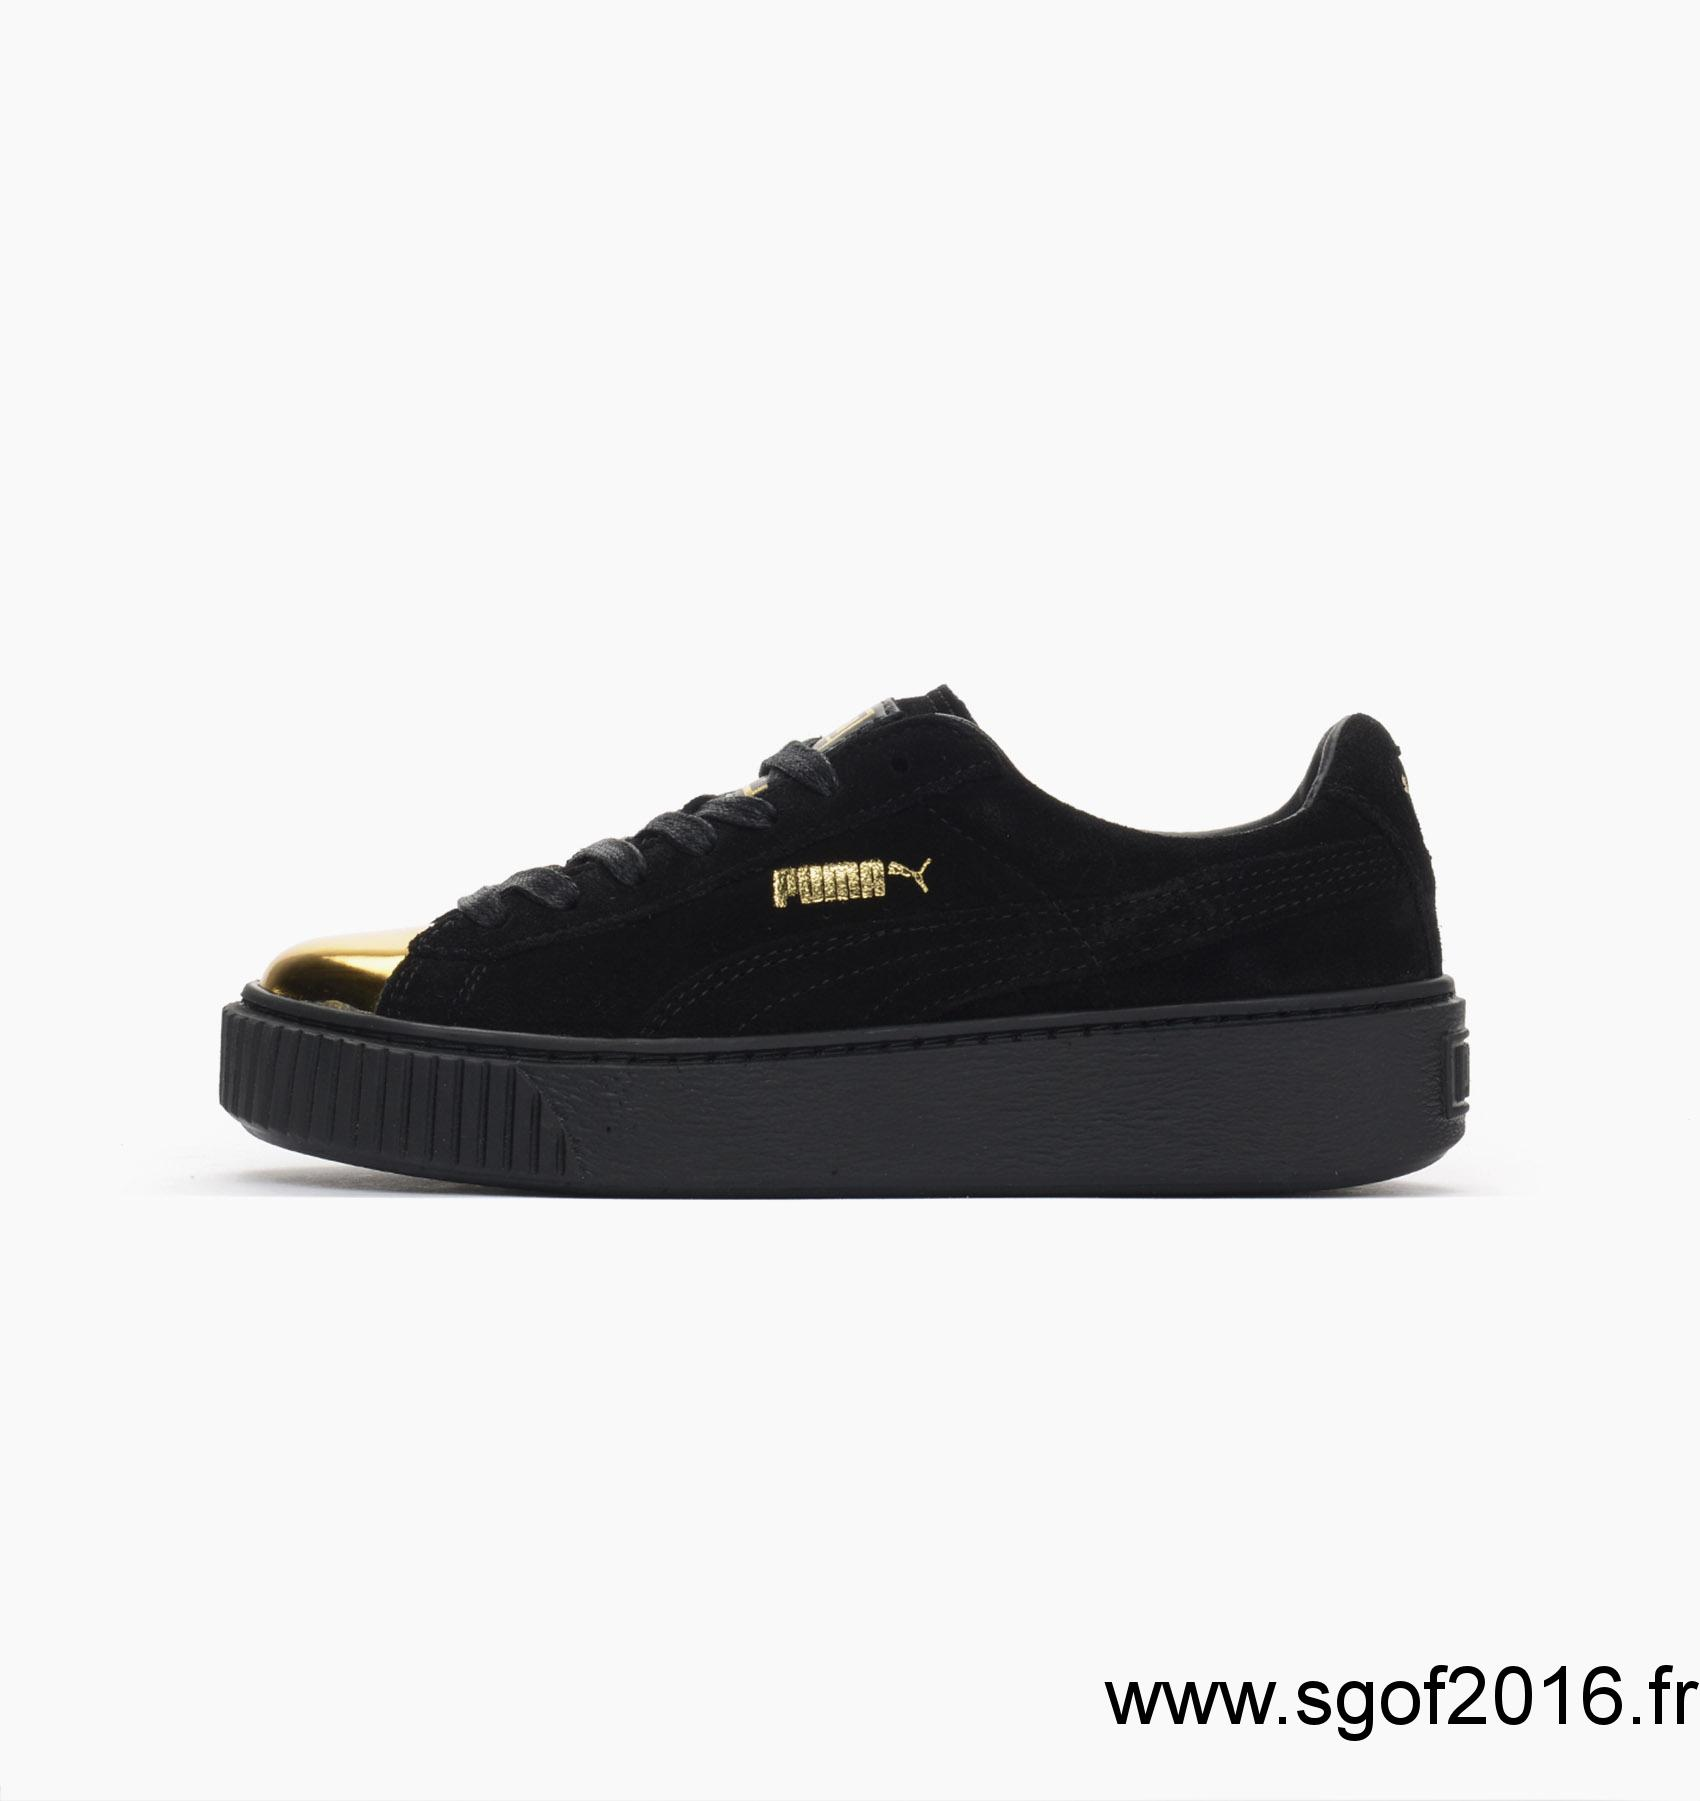 taille chaussure puma nike